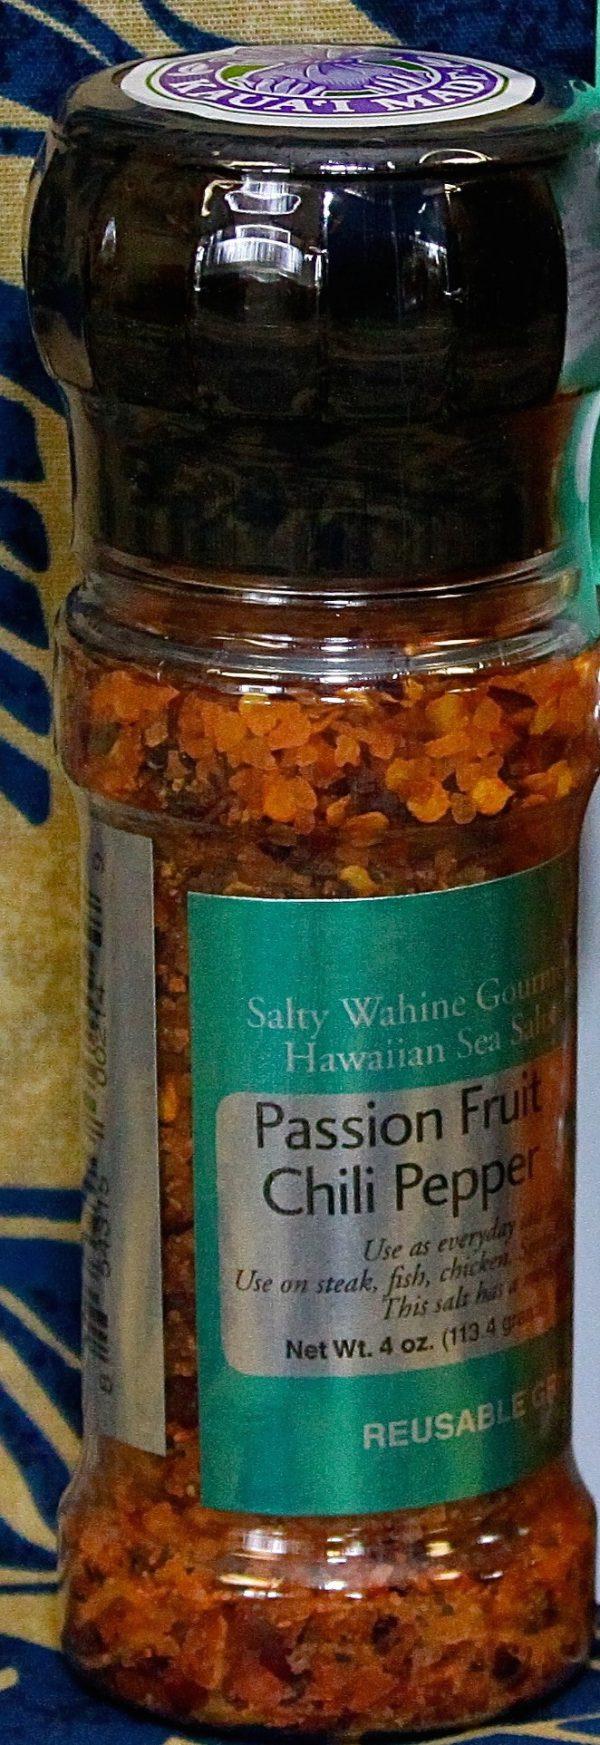 Tutu's Pantry - Passion Fruit Chilli Pepper Salt Refillable Grinder - 1